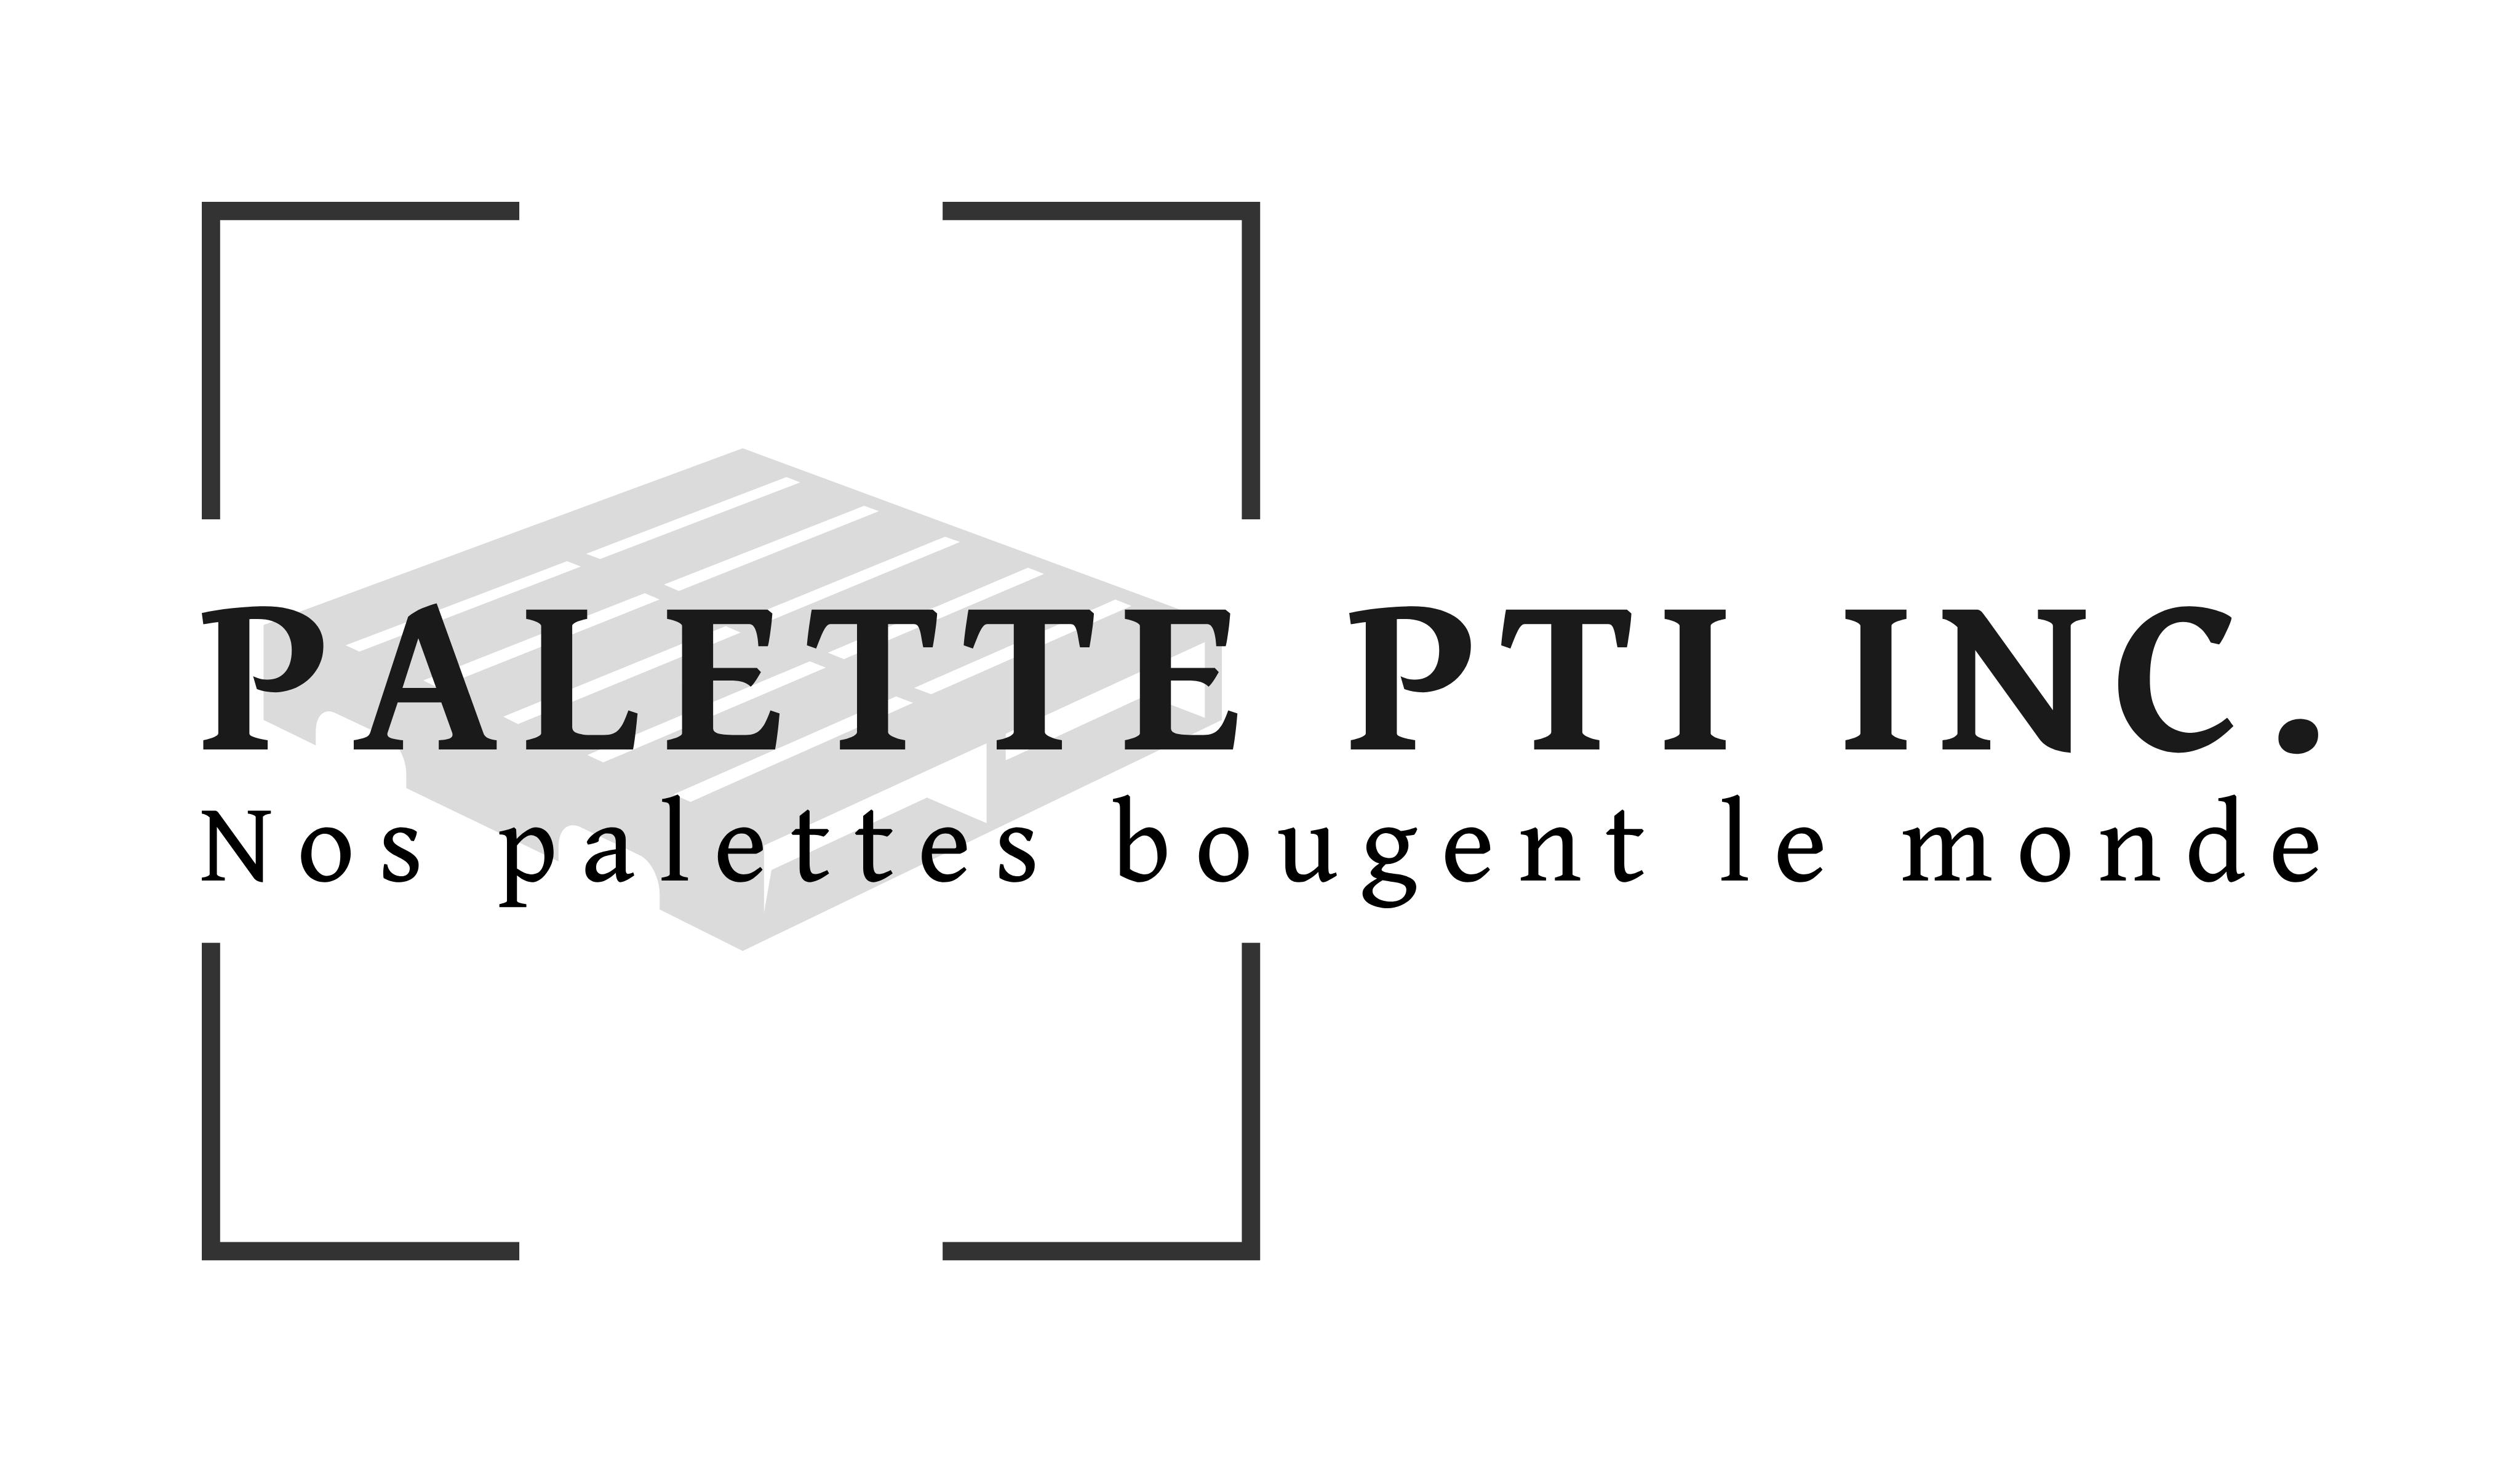 Palette PTI